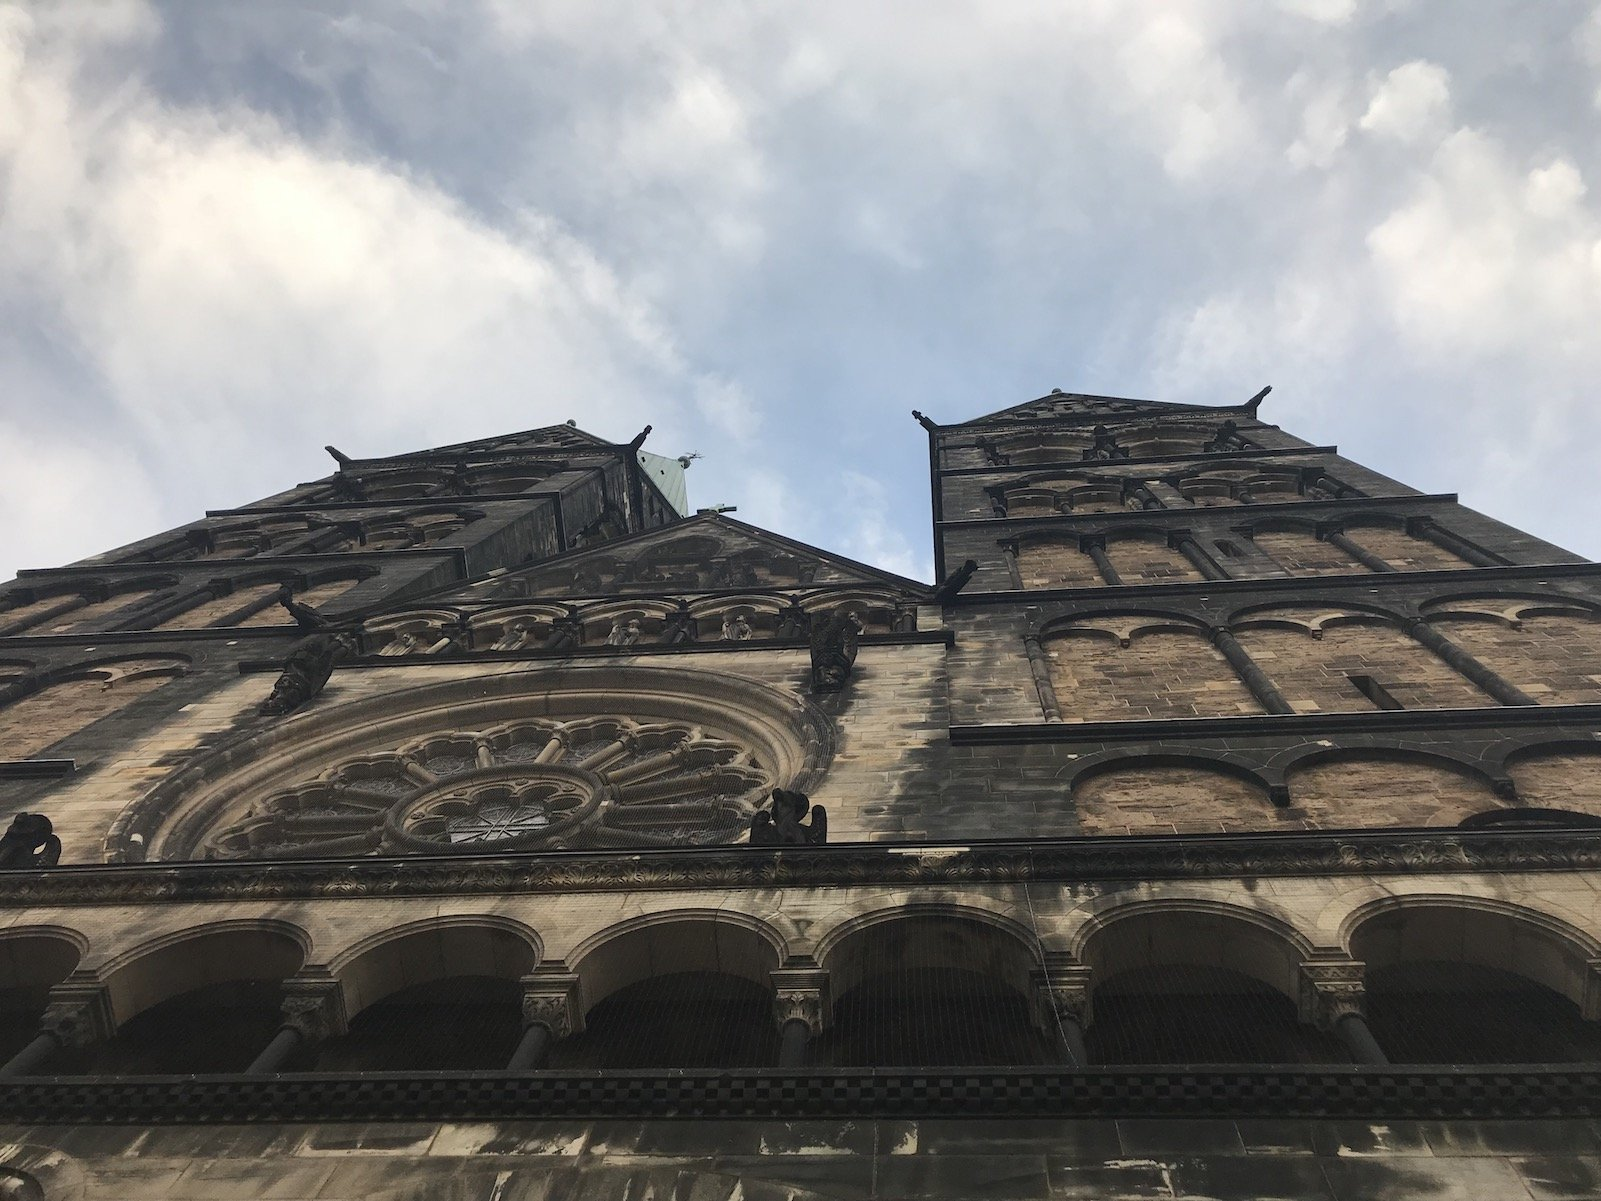 St. Petri Dom in Bremen